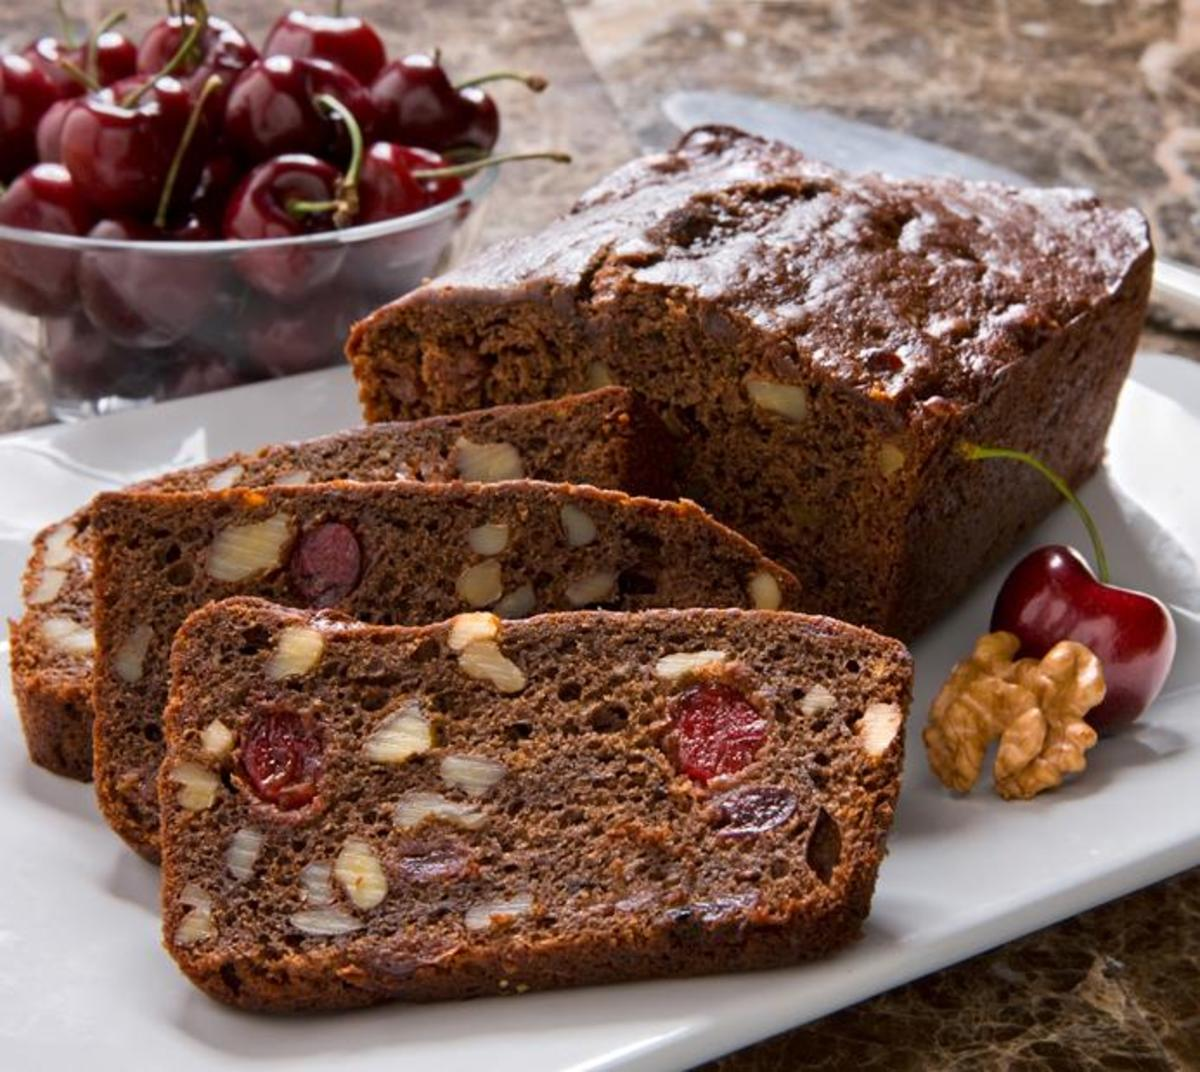 Cherry Walnut Chocolate Bread